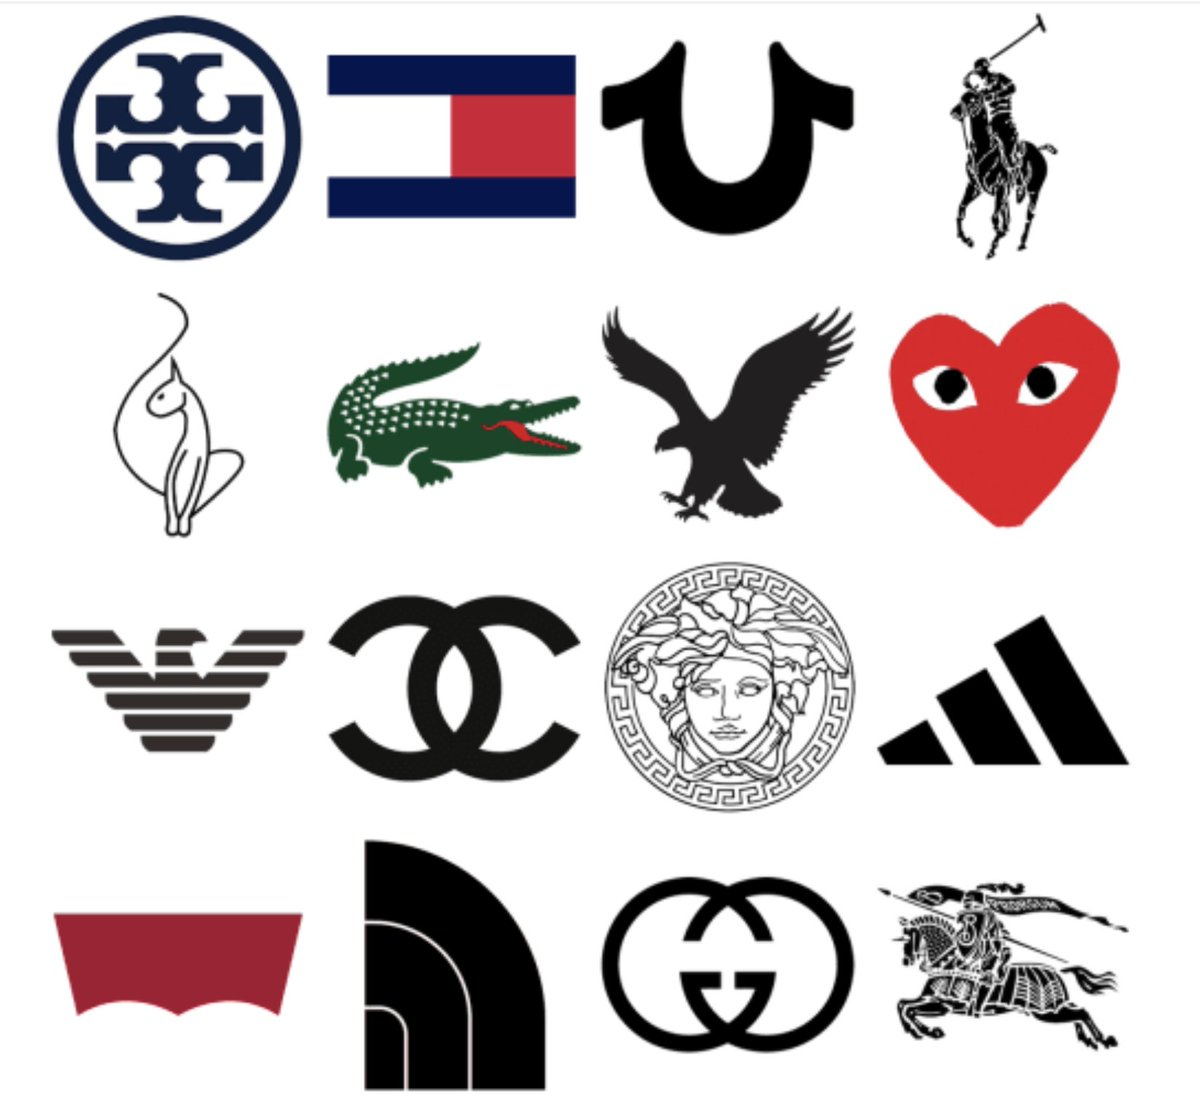 Logo Quiz, How well do you know your fashion logo's?#logodesign #logo #graphicdesign #quiz #fashion https://t.co/85wbMcvdz4